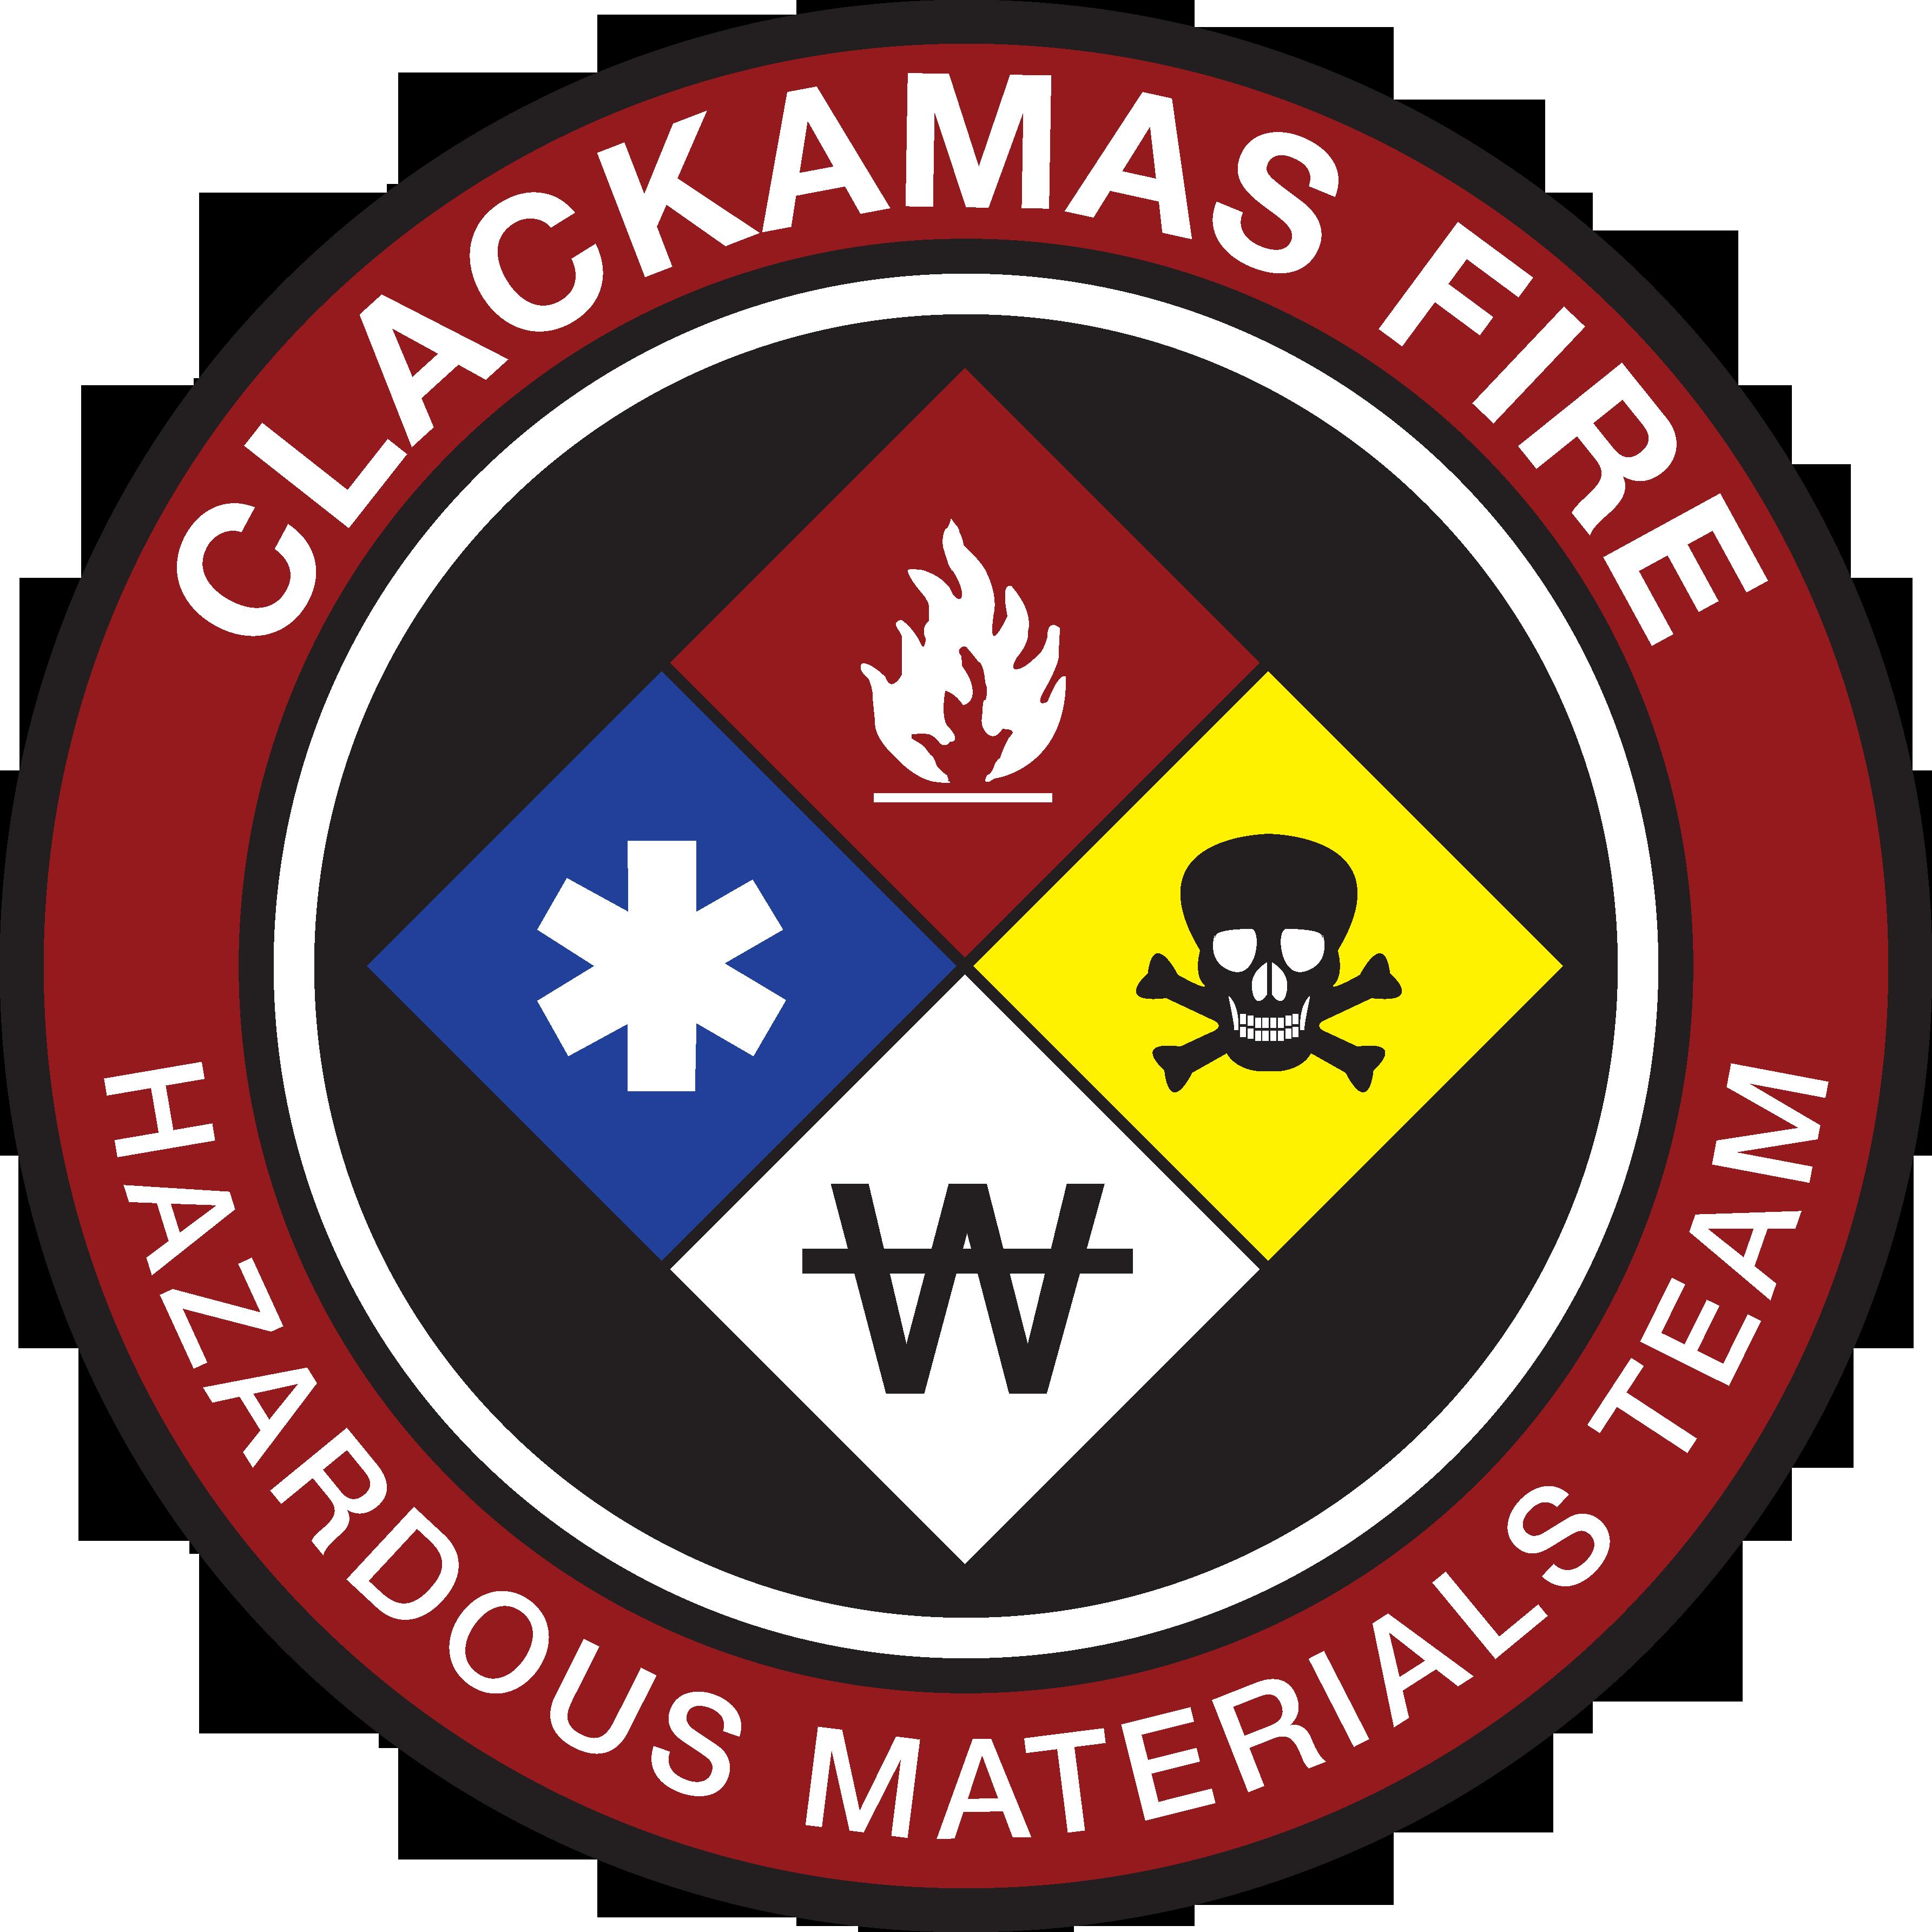 cfd1-hazmat-logo